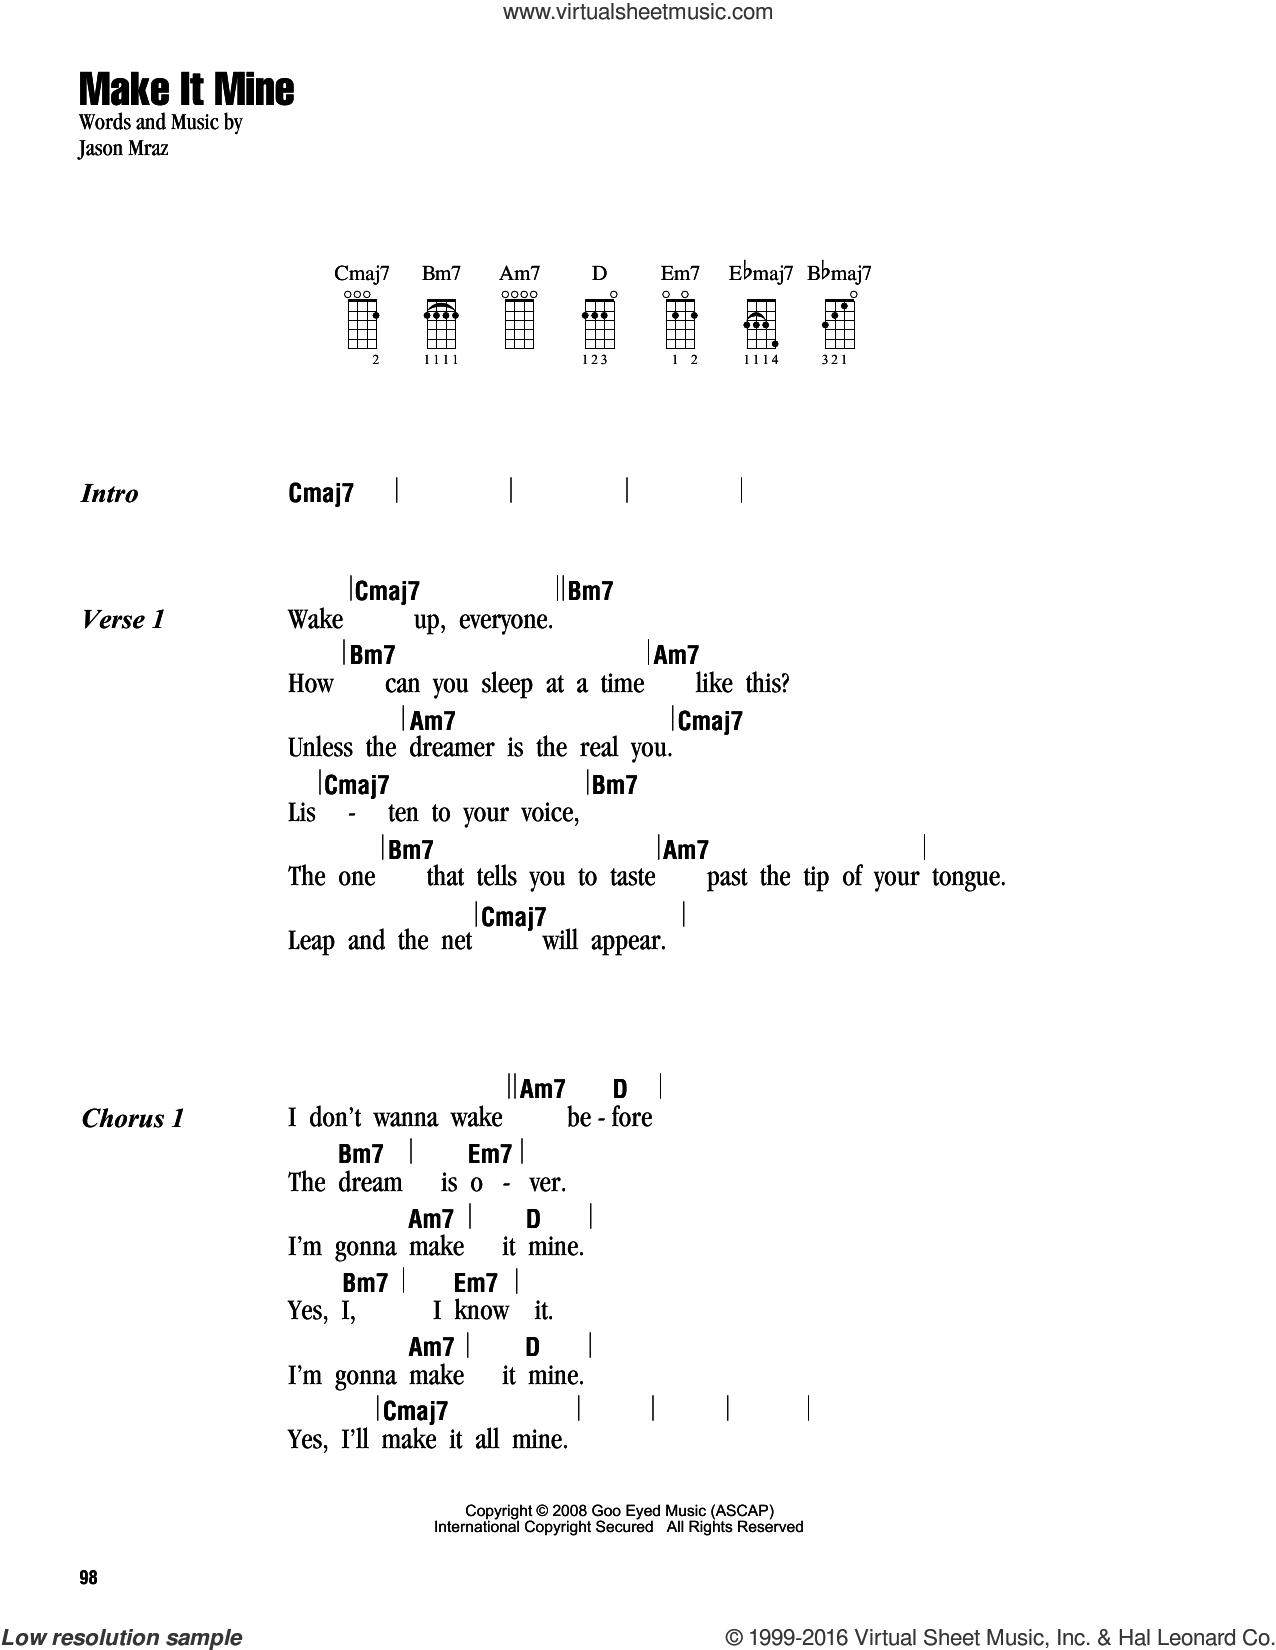 Make It Mine sheet music for ukulele (chords) by Jason Mraz, intermediate skill level